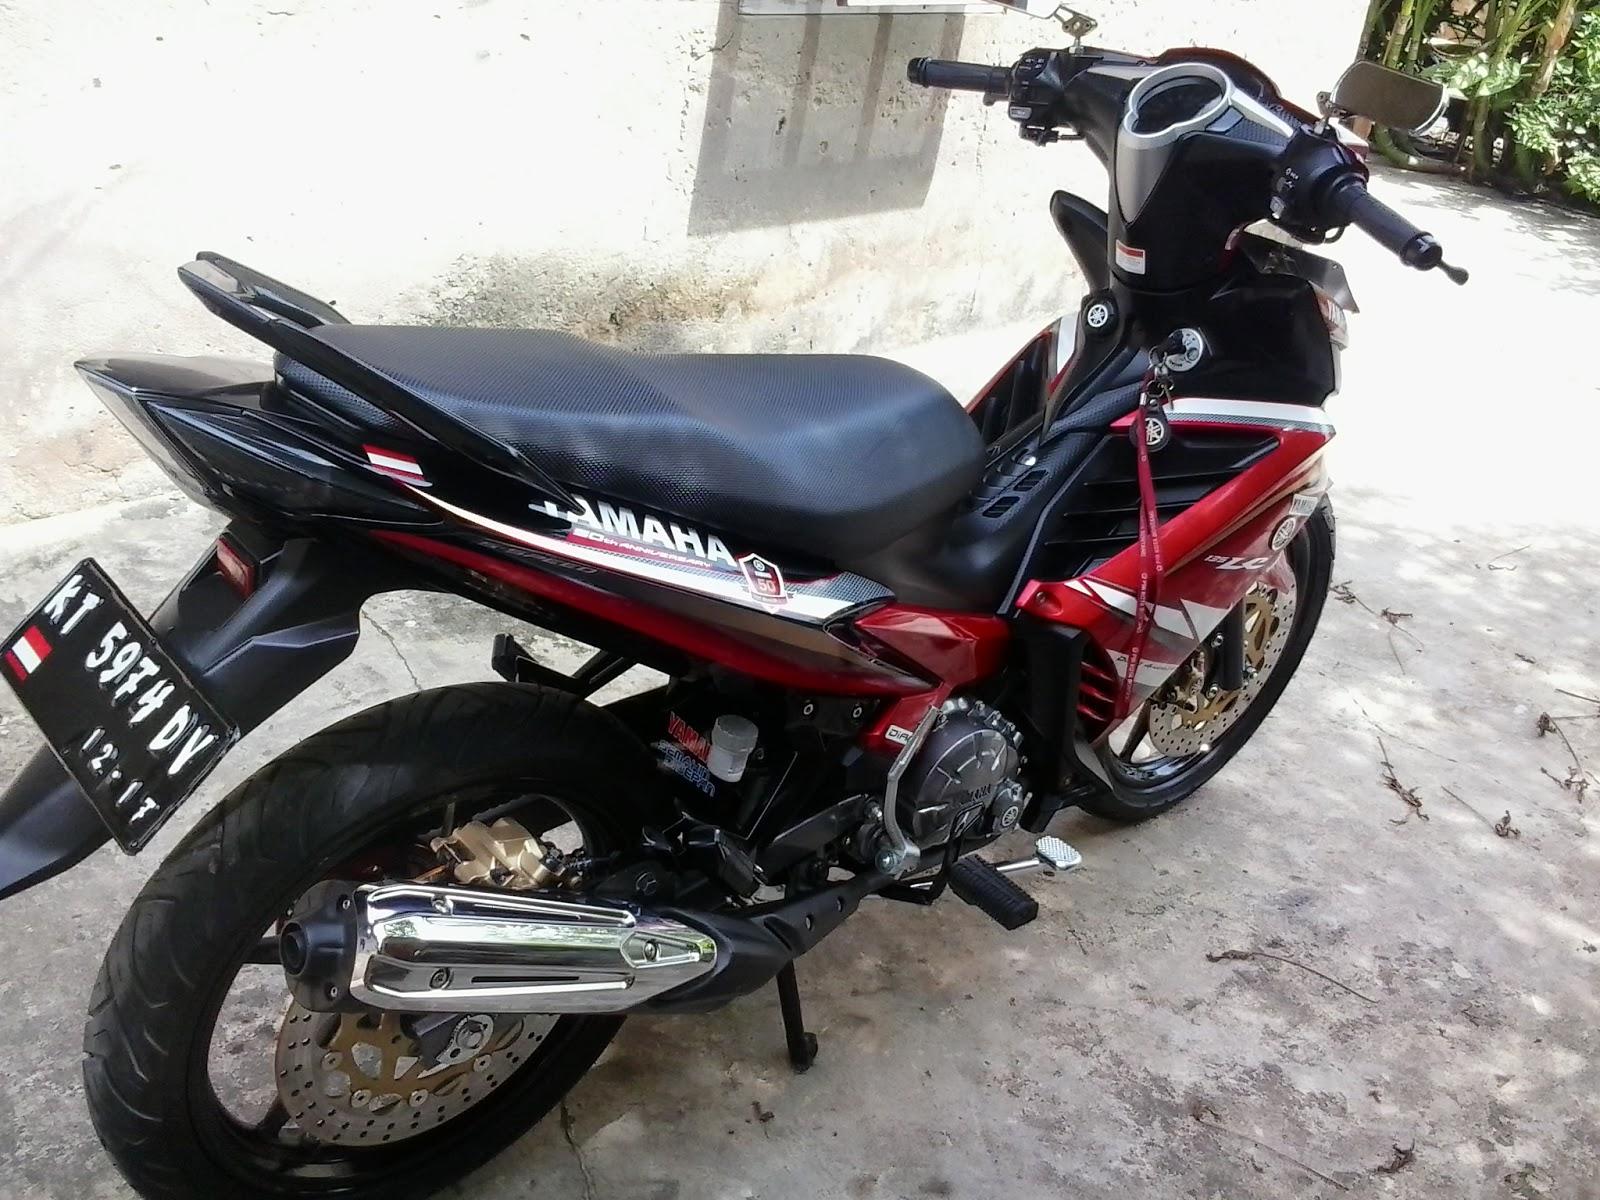 MODIFIKASI MOTOR NEW JUPITER MX KARYA ANAK BONTANG